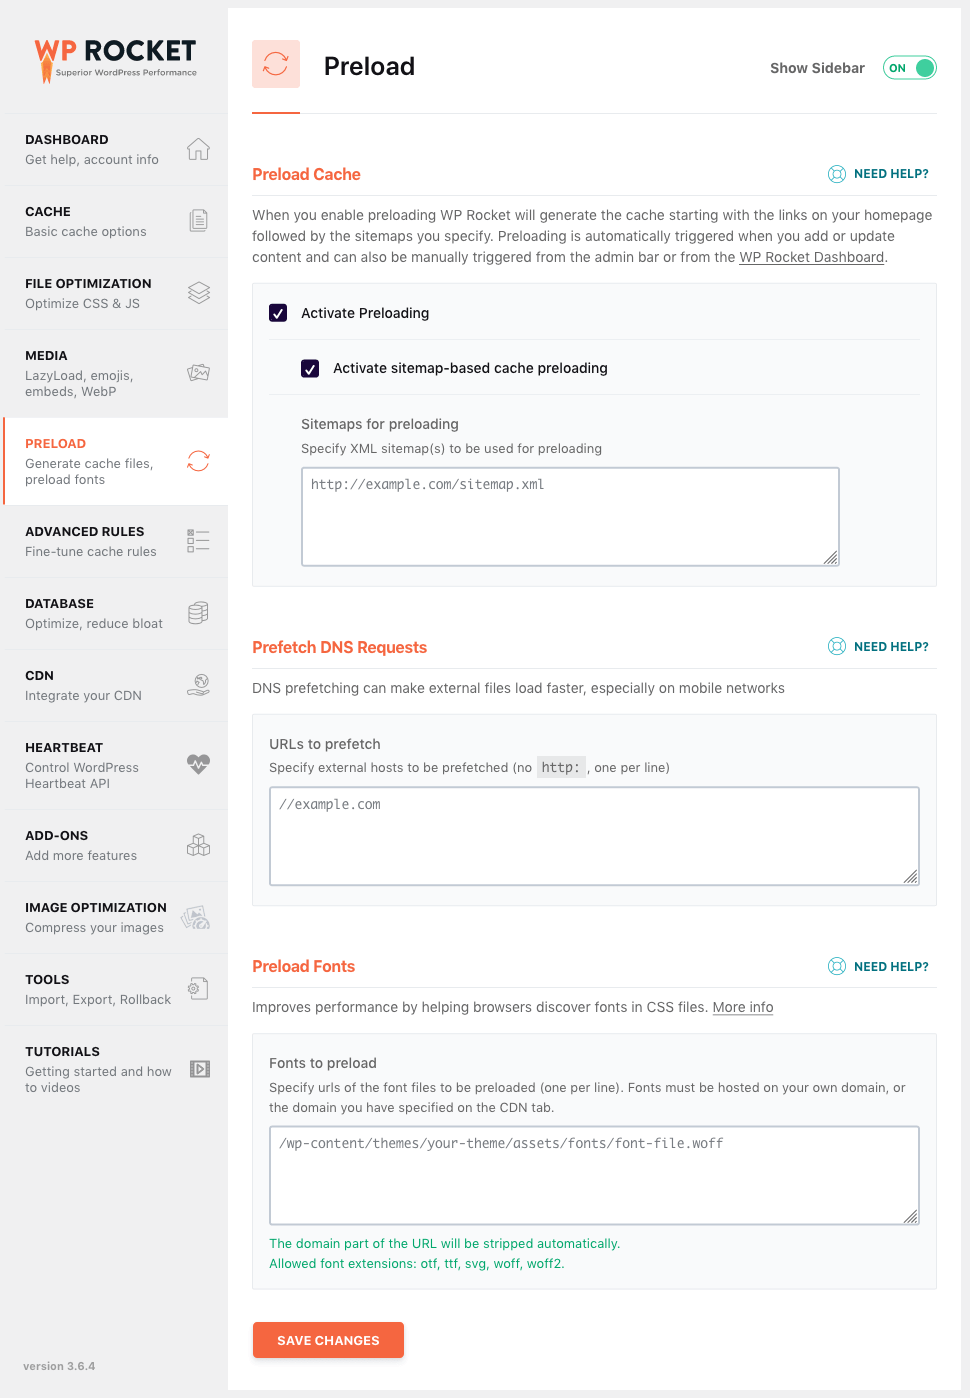 WP Rocket preload settings